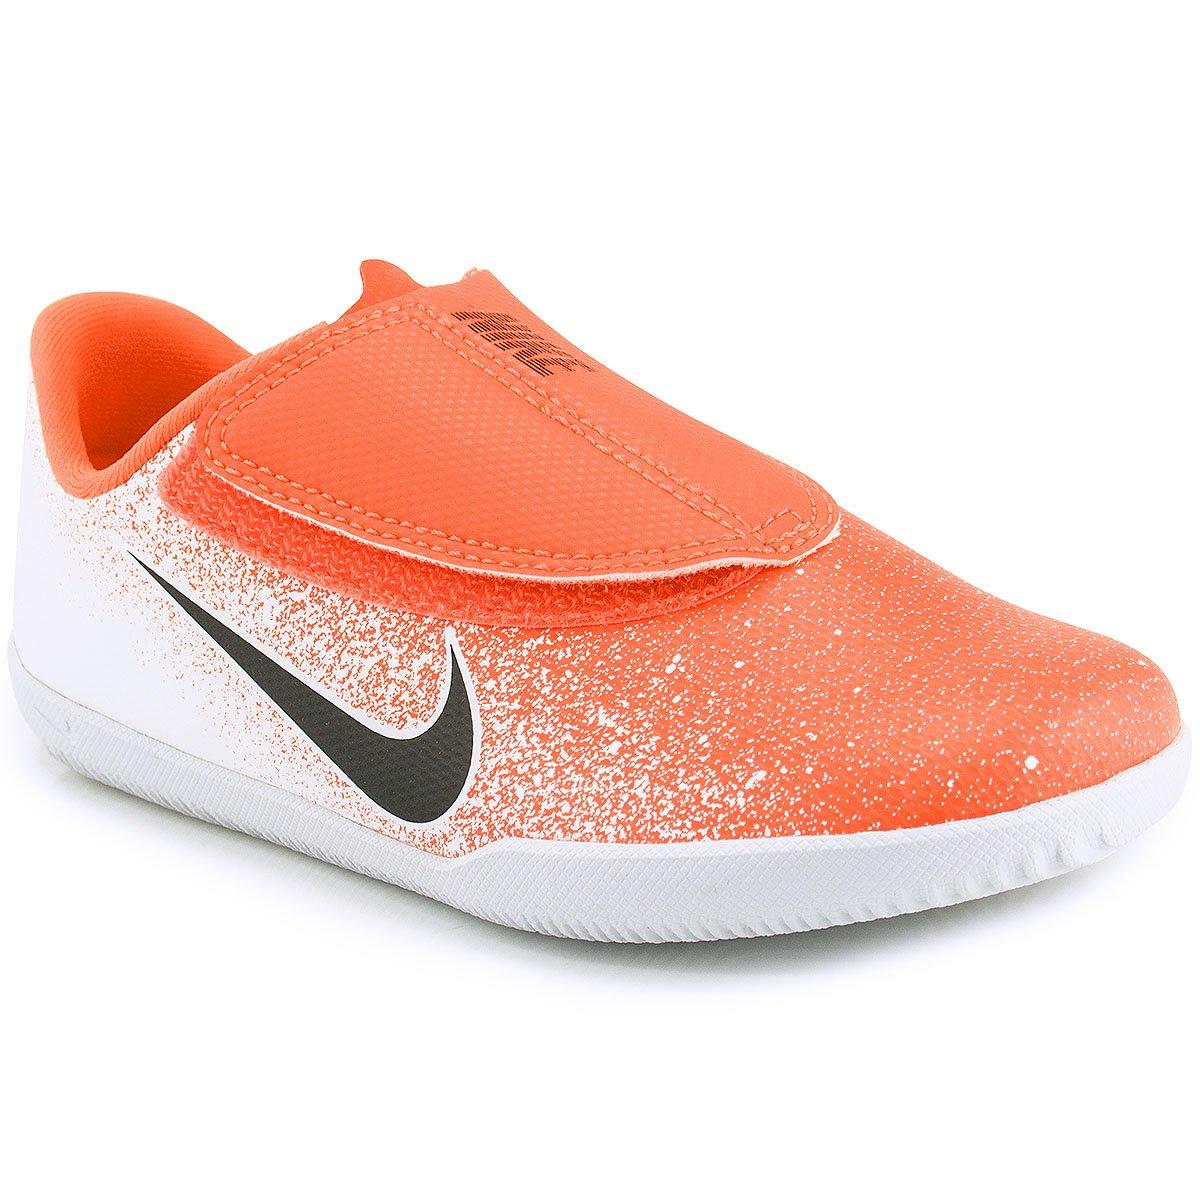 7b14a8bcf6 Chuteira Nike Mercurial Vapor 12 Club IC